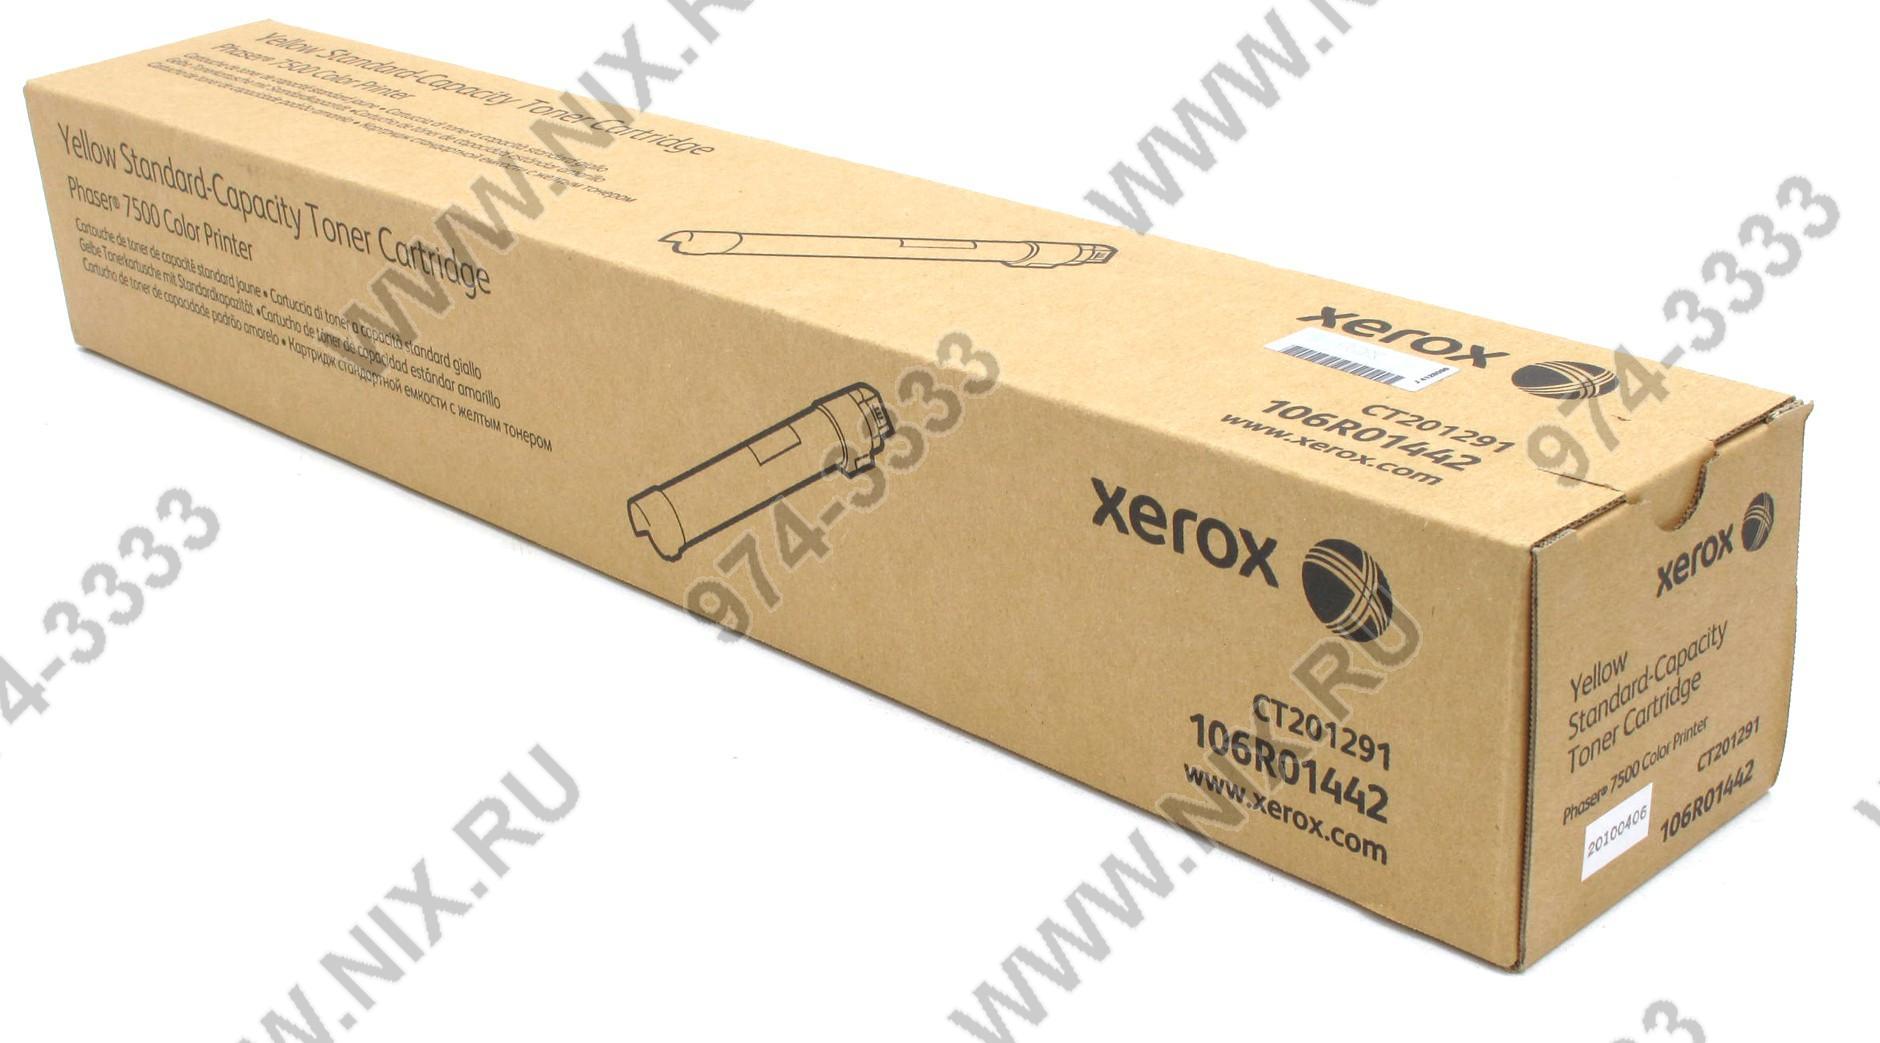 Xerox 106r01445 тонер-картридж phaser 7500 (жёлтый, 17 800 стр)